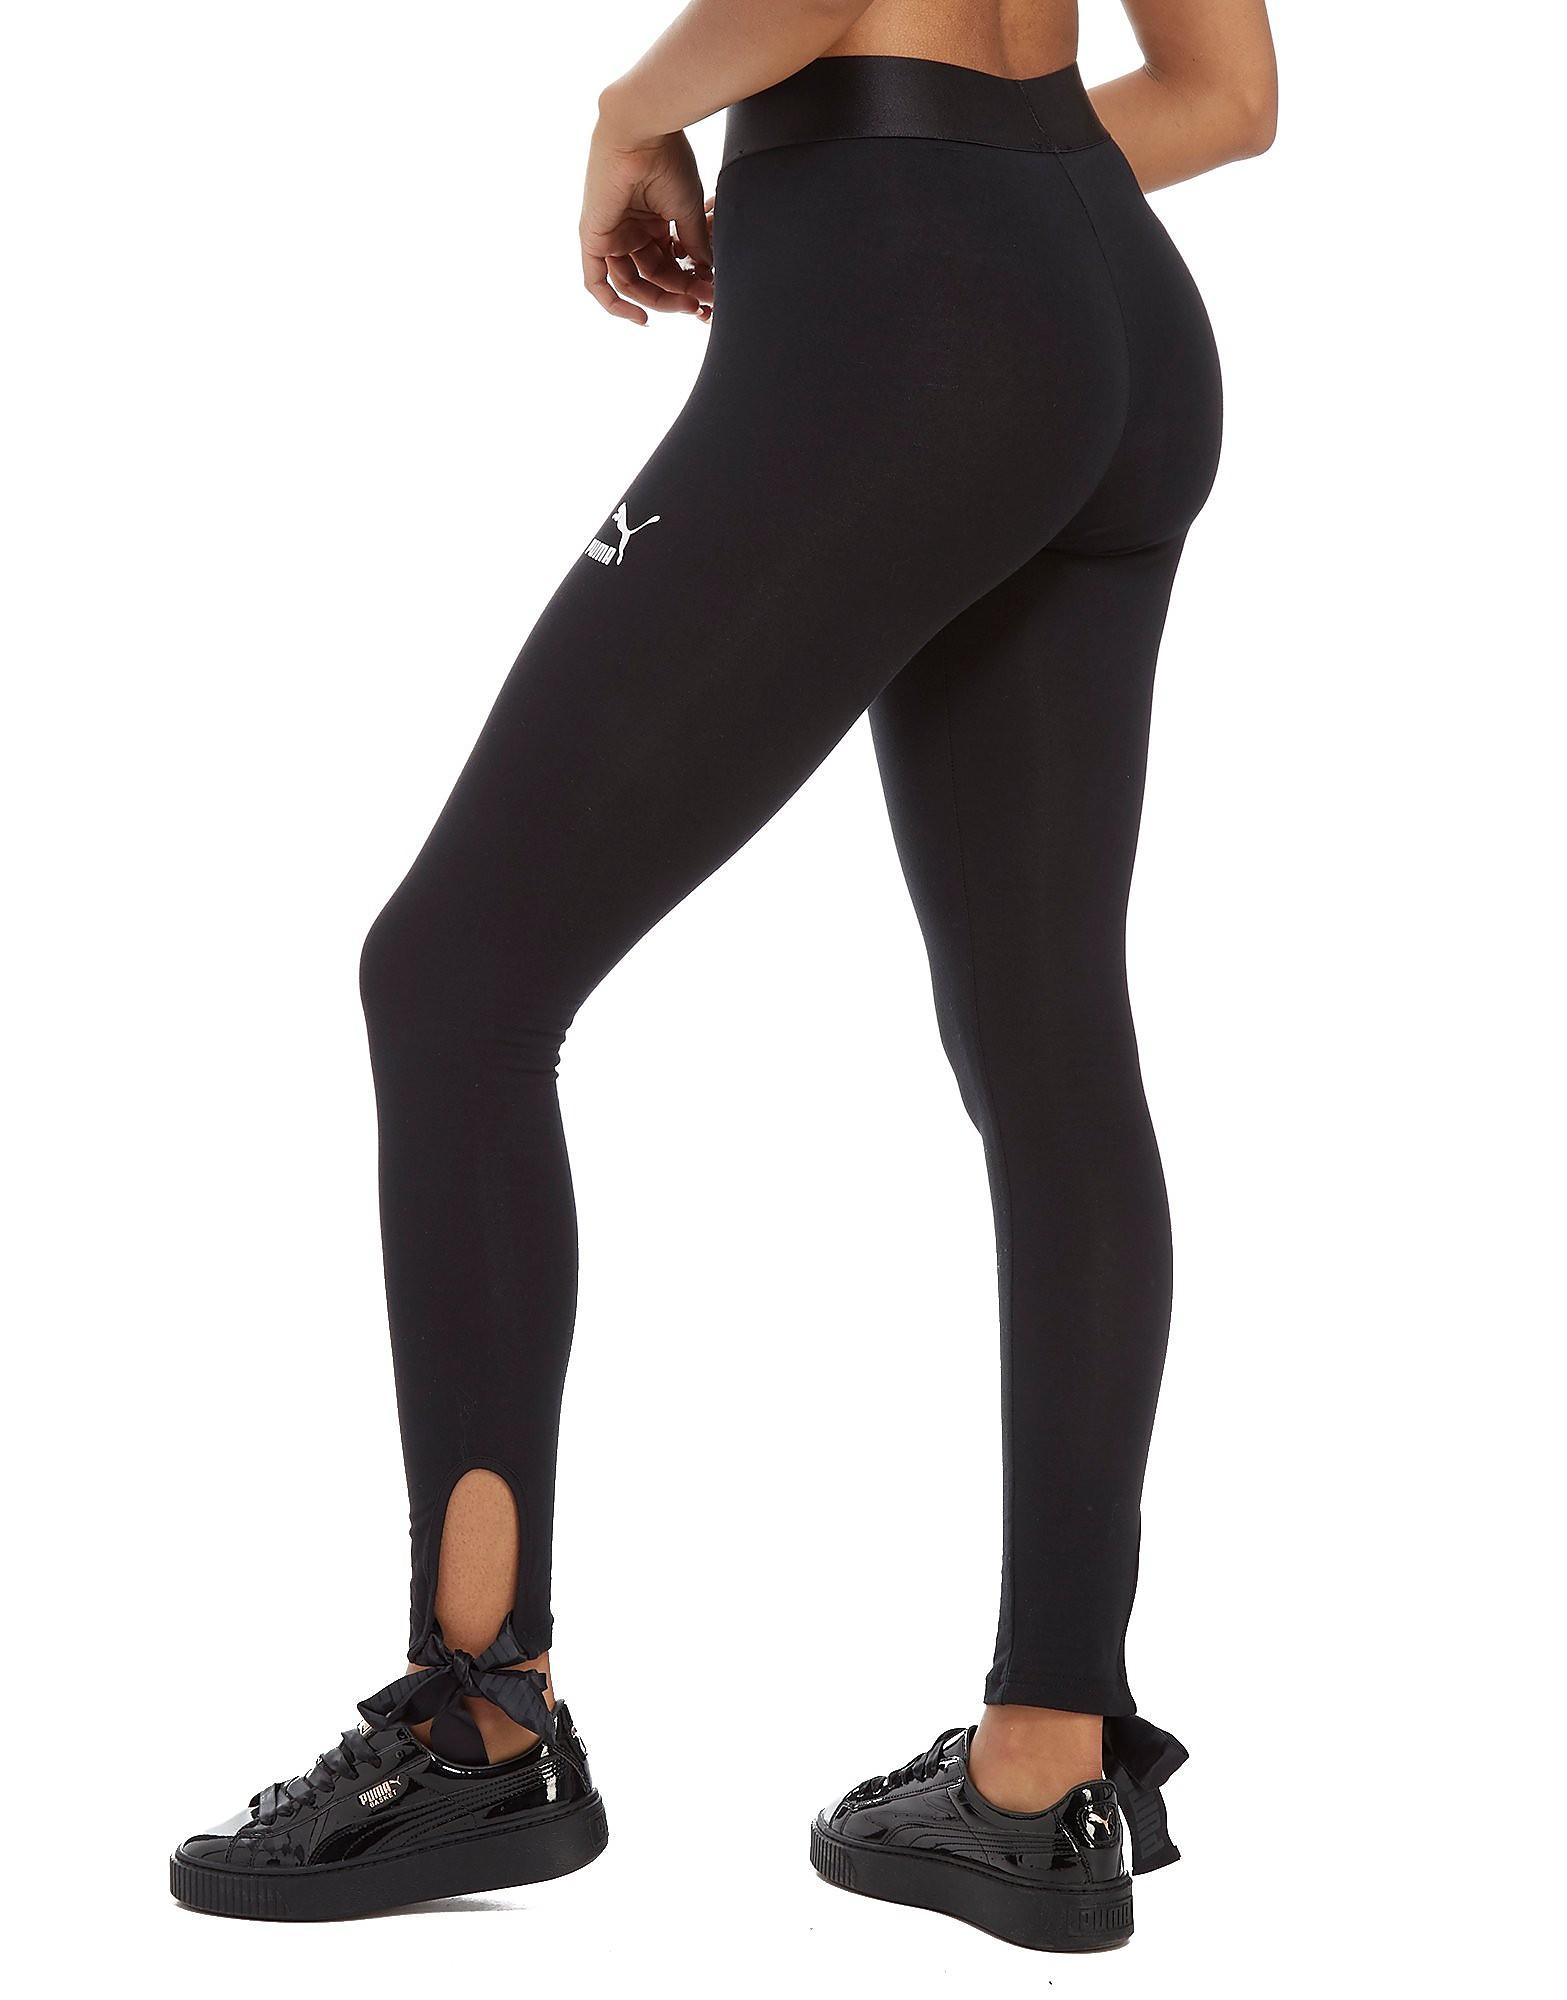 PUMA Bow Leggings